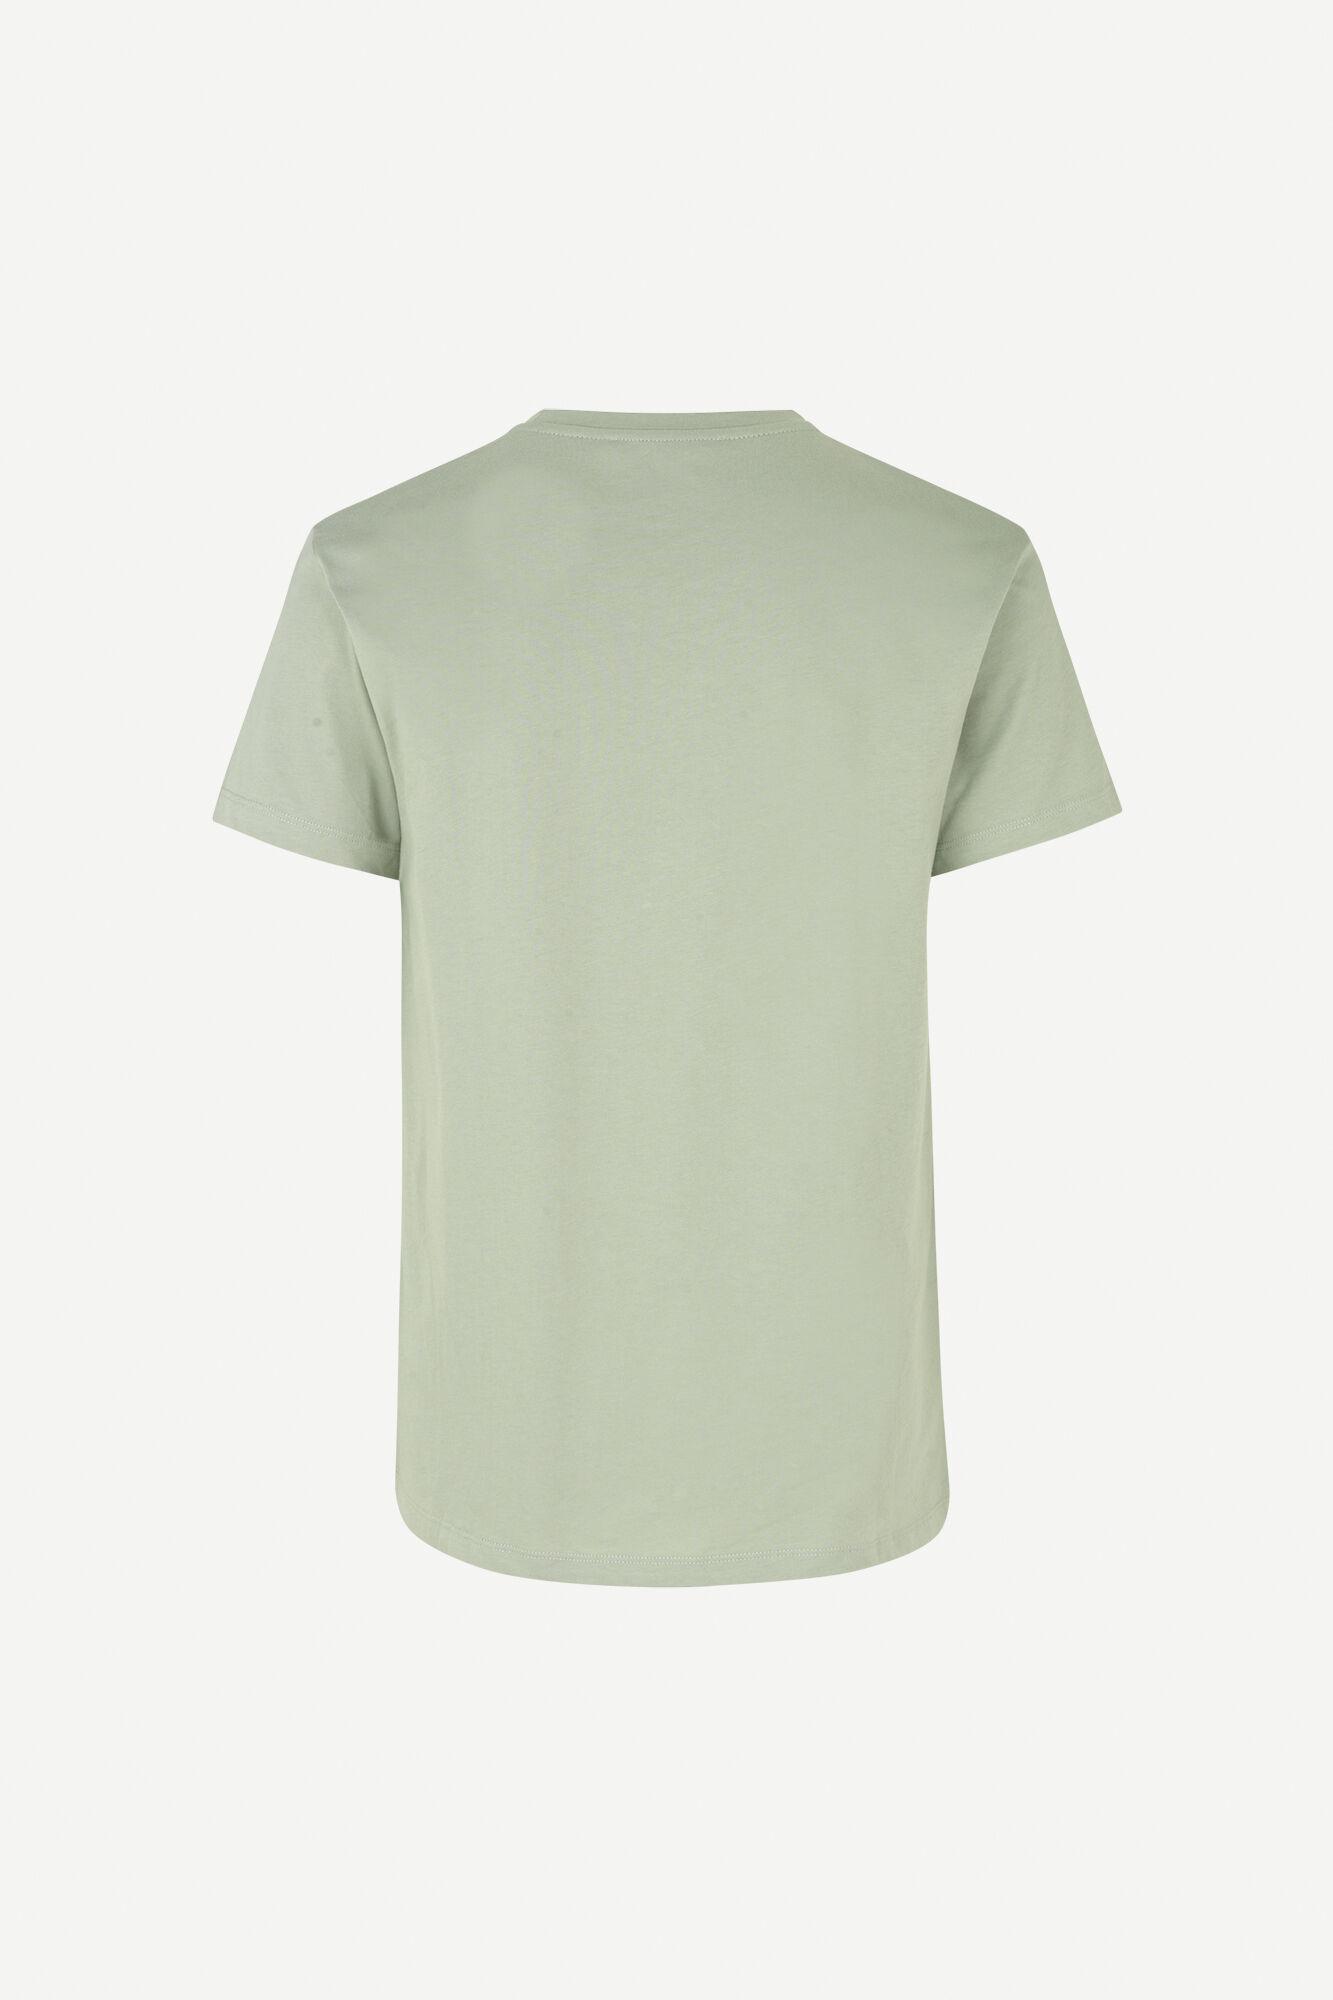 Samsøe & Samsøe Kronos O-N S/S t-shirt, seagrass, large